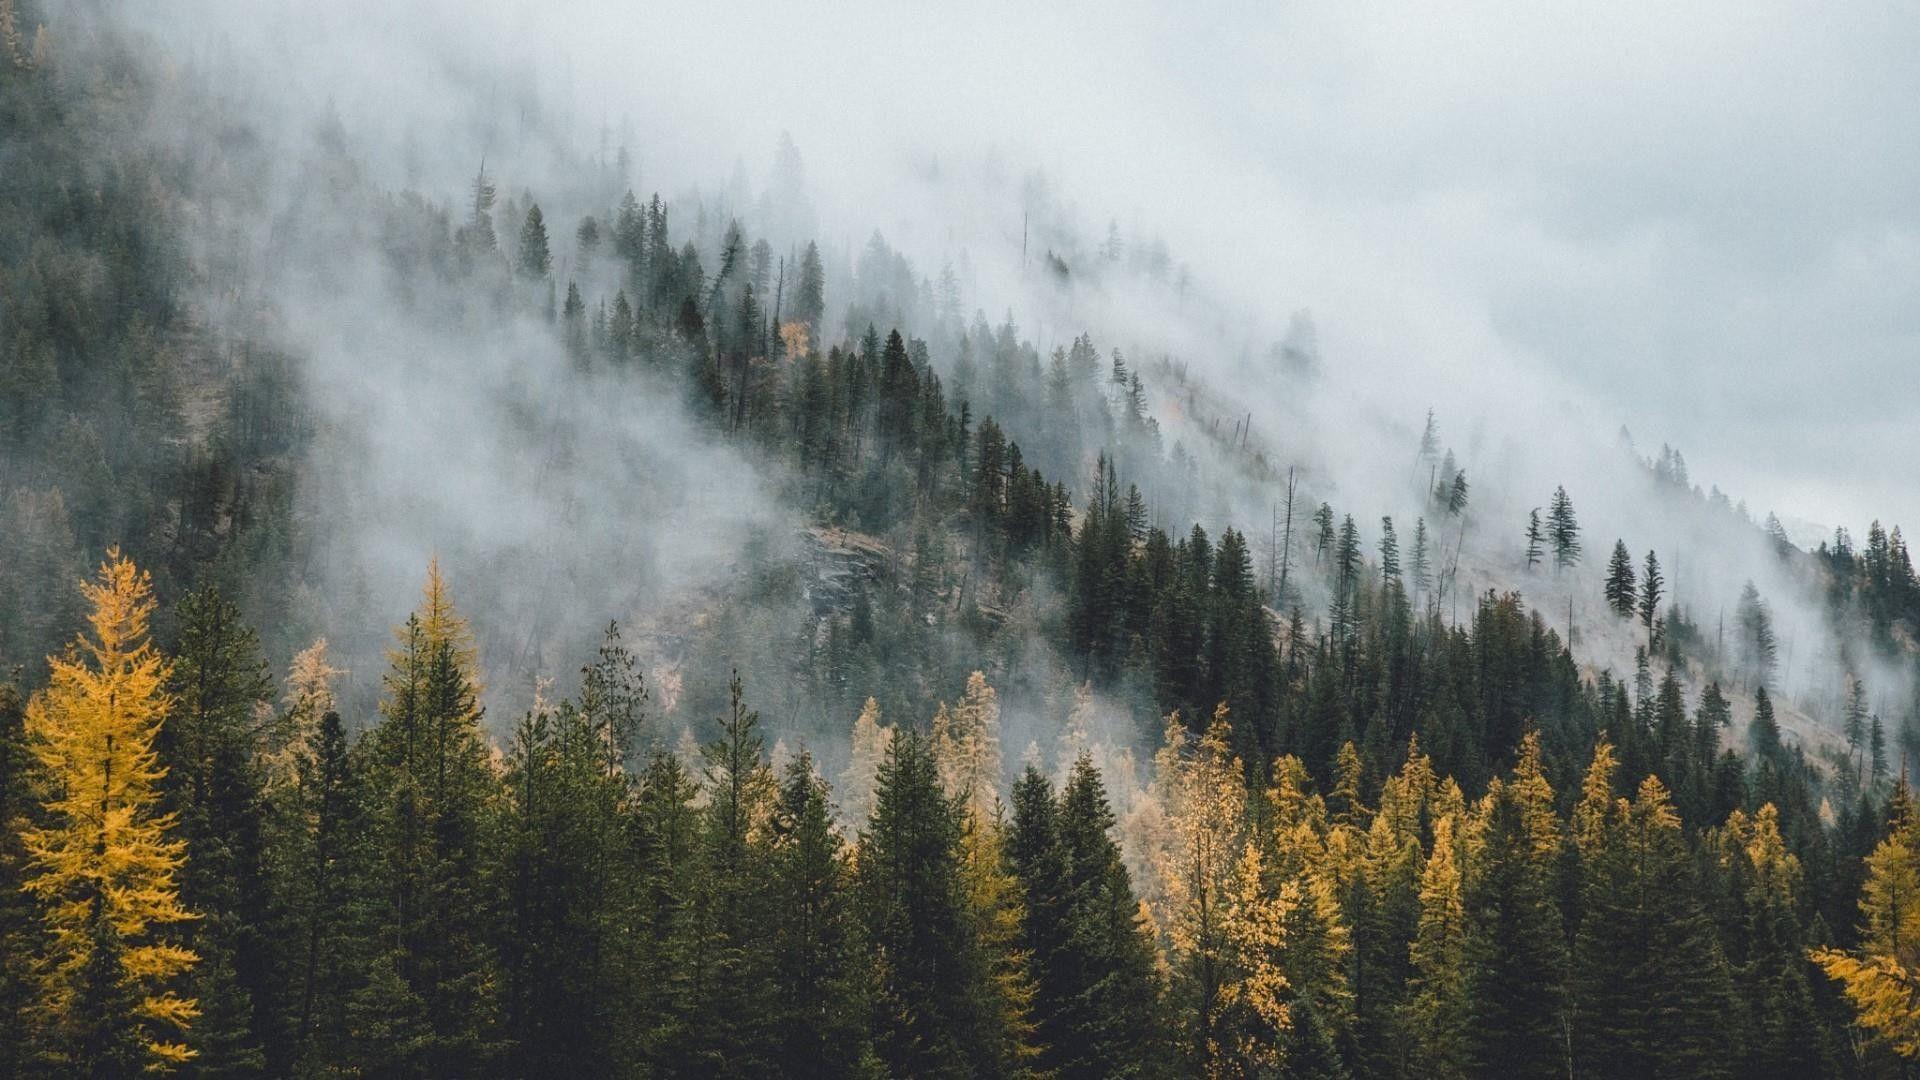 Res 19201080 Misty Pine Forest Wallpaper Wallpaper